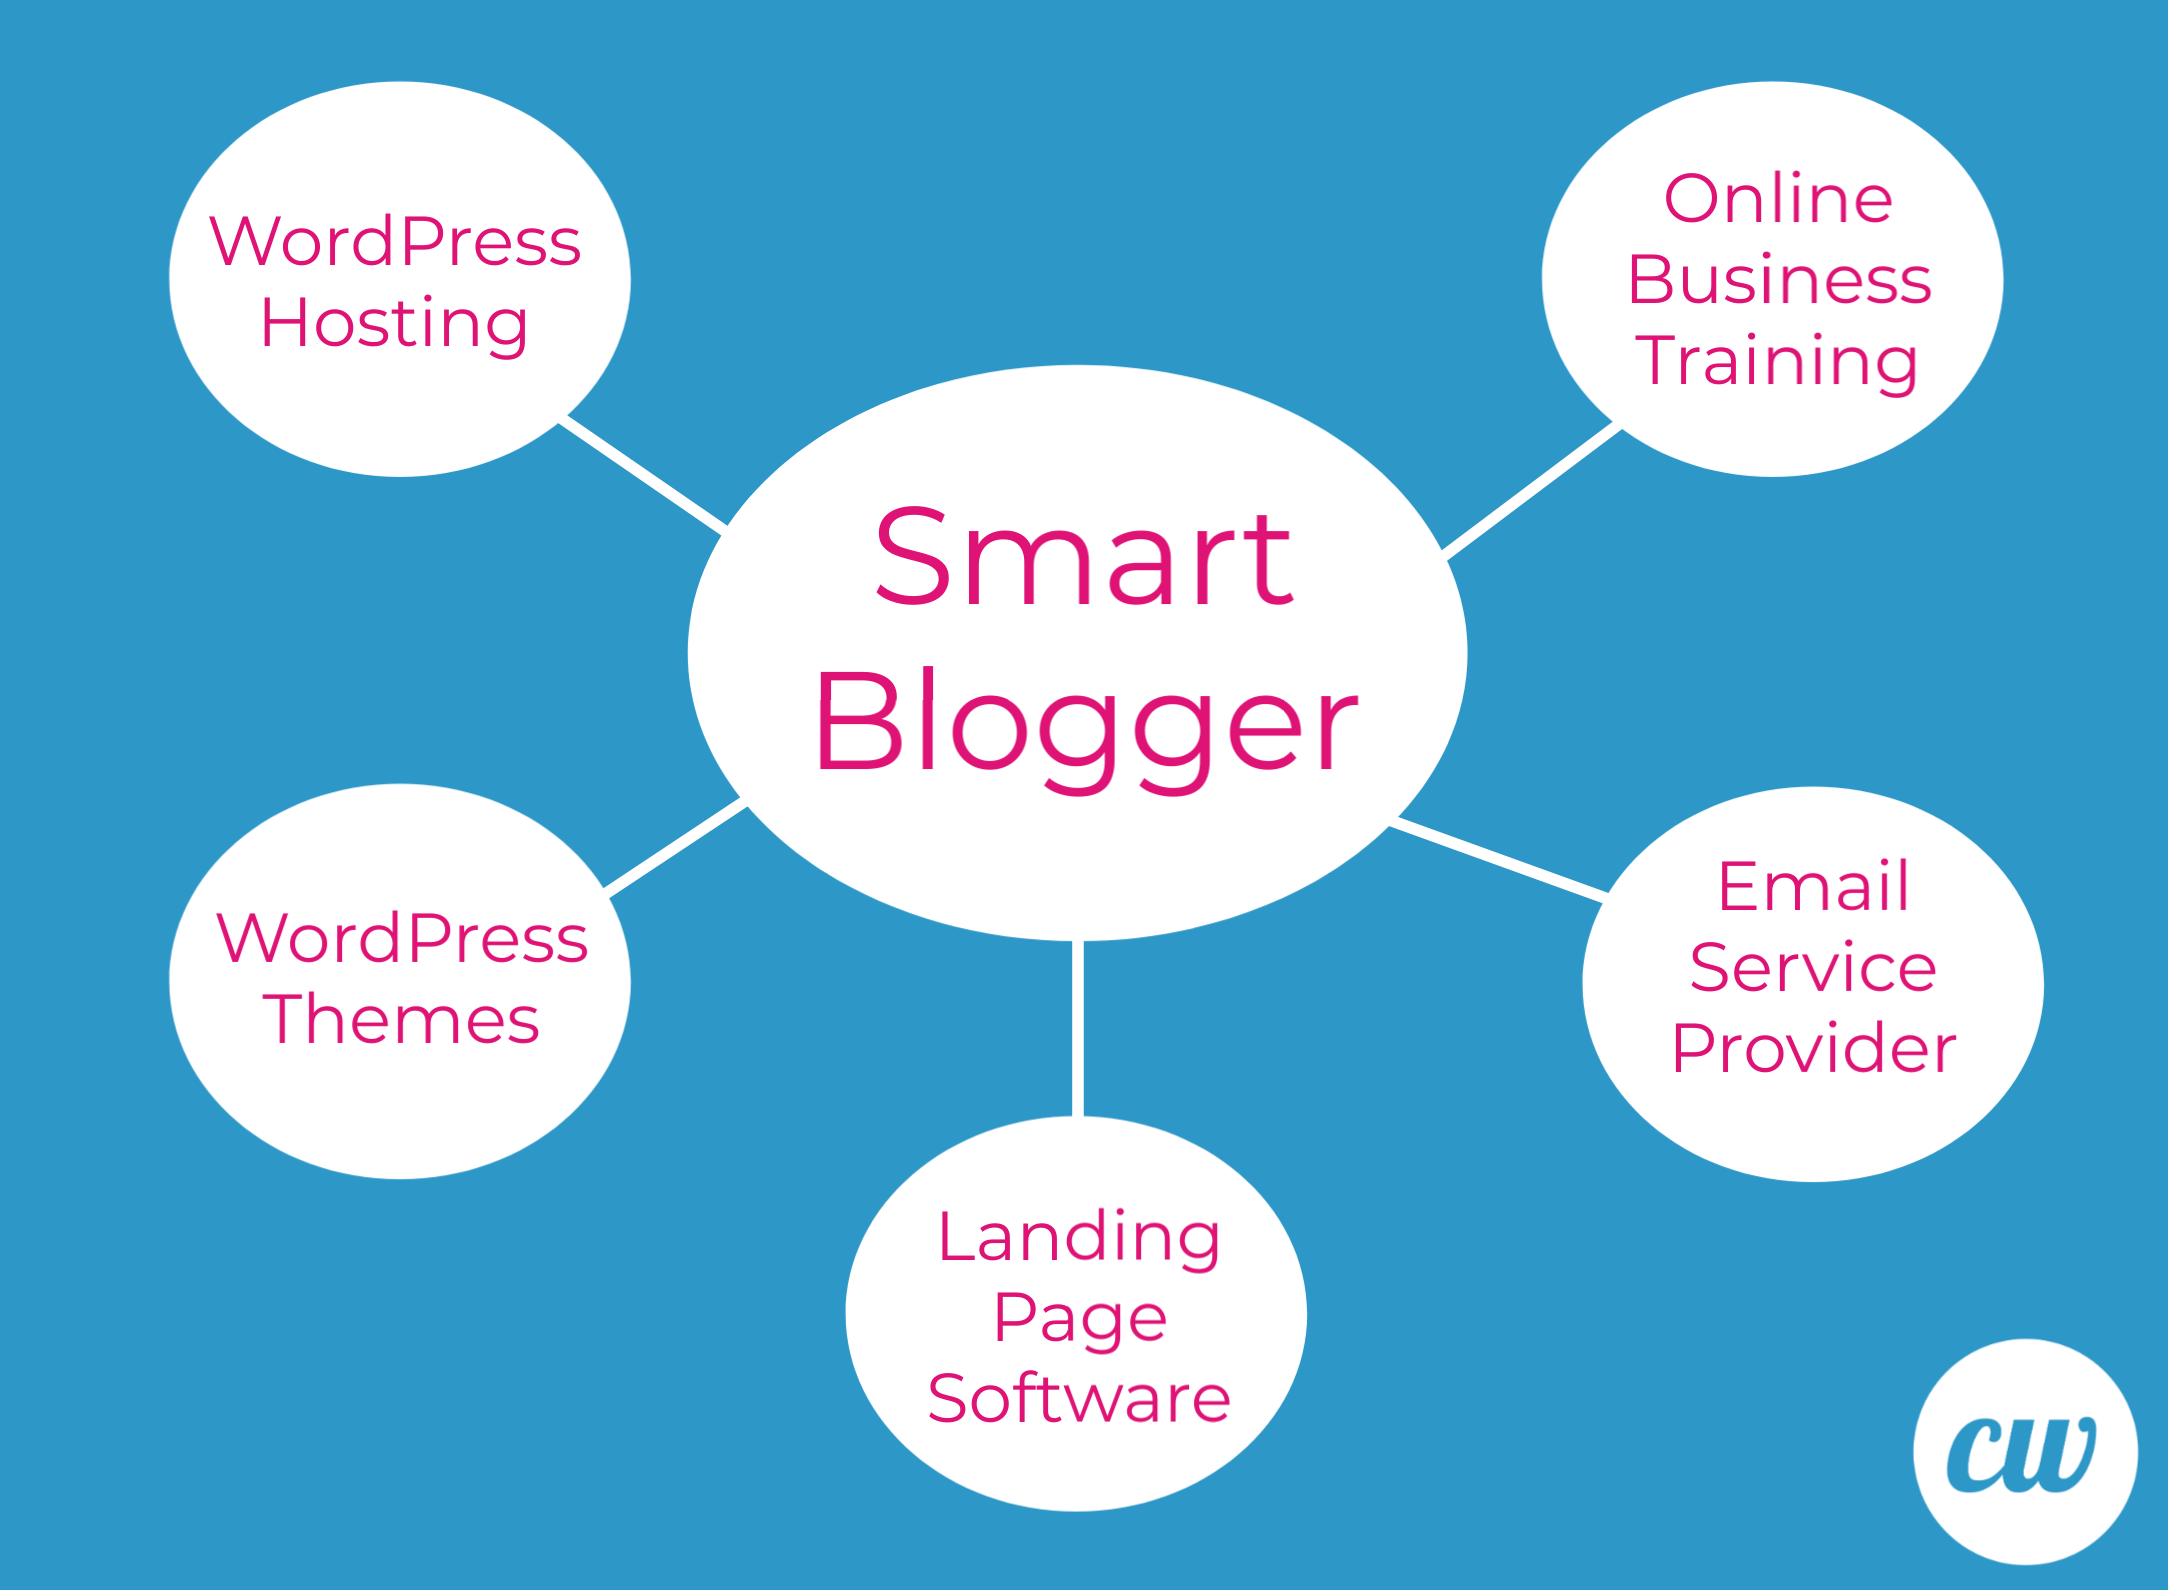 Smart Blogger Graphic